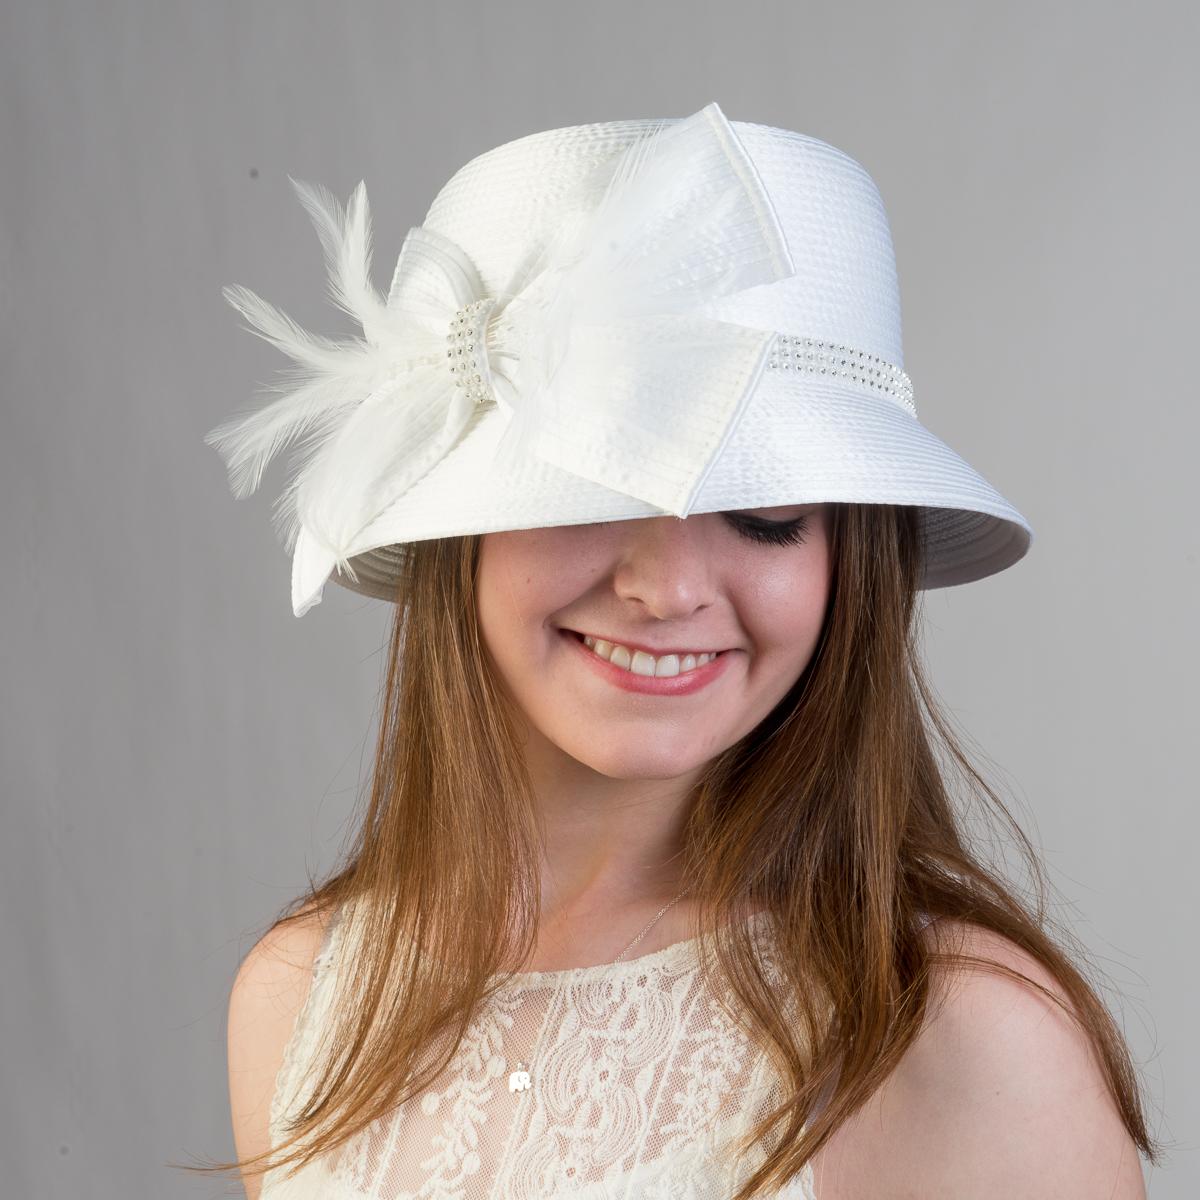 5662fd6c7c8 White Father And Rhinestone Satin Metallic Bucket Hats-321777-WT- Sun  Yorkos